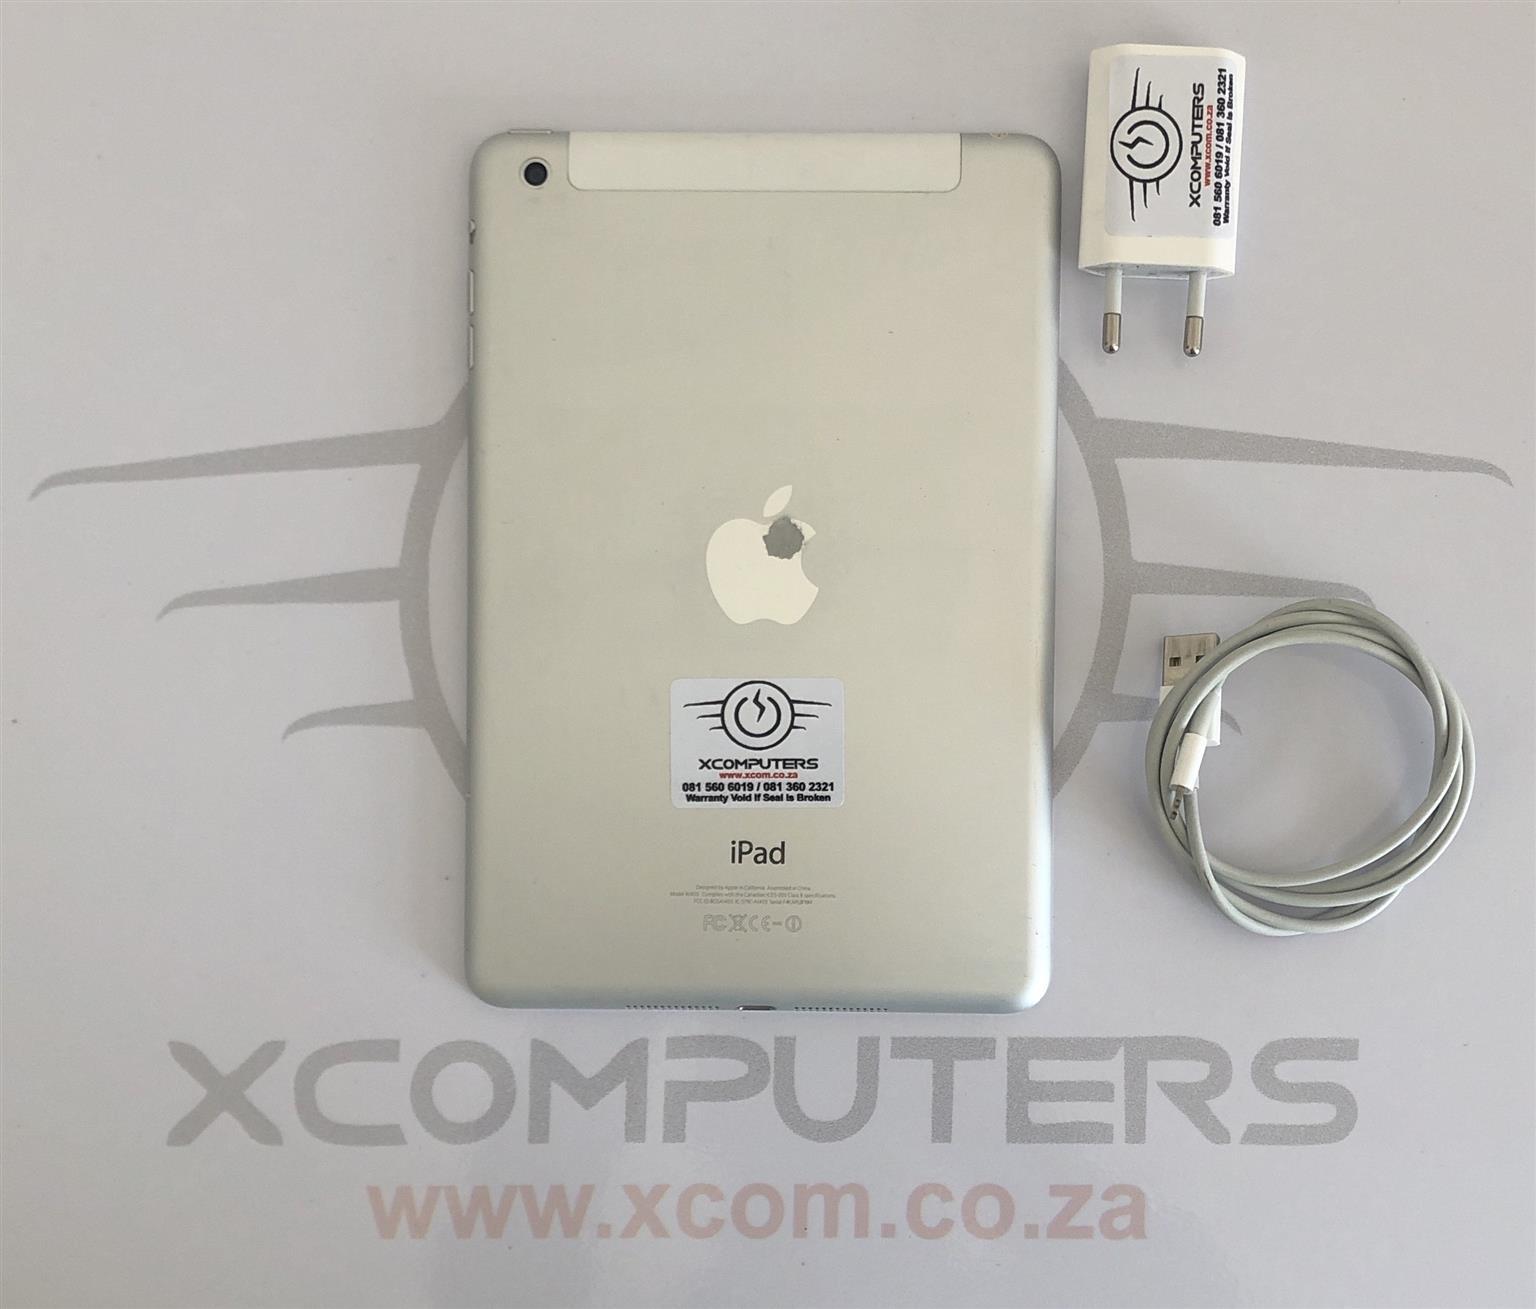 iPad Air 2 WiFi & 3GB 64GB for Sale R2100